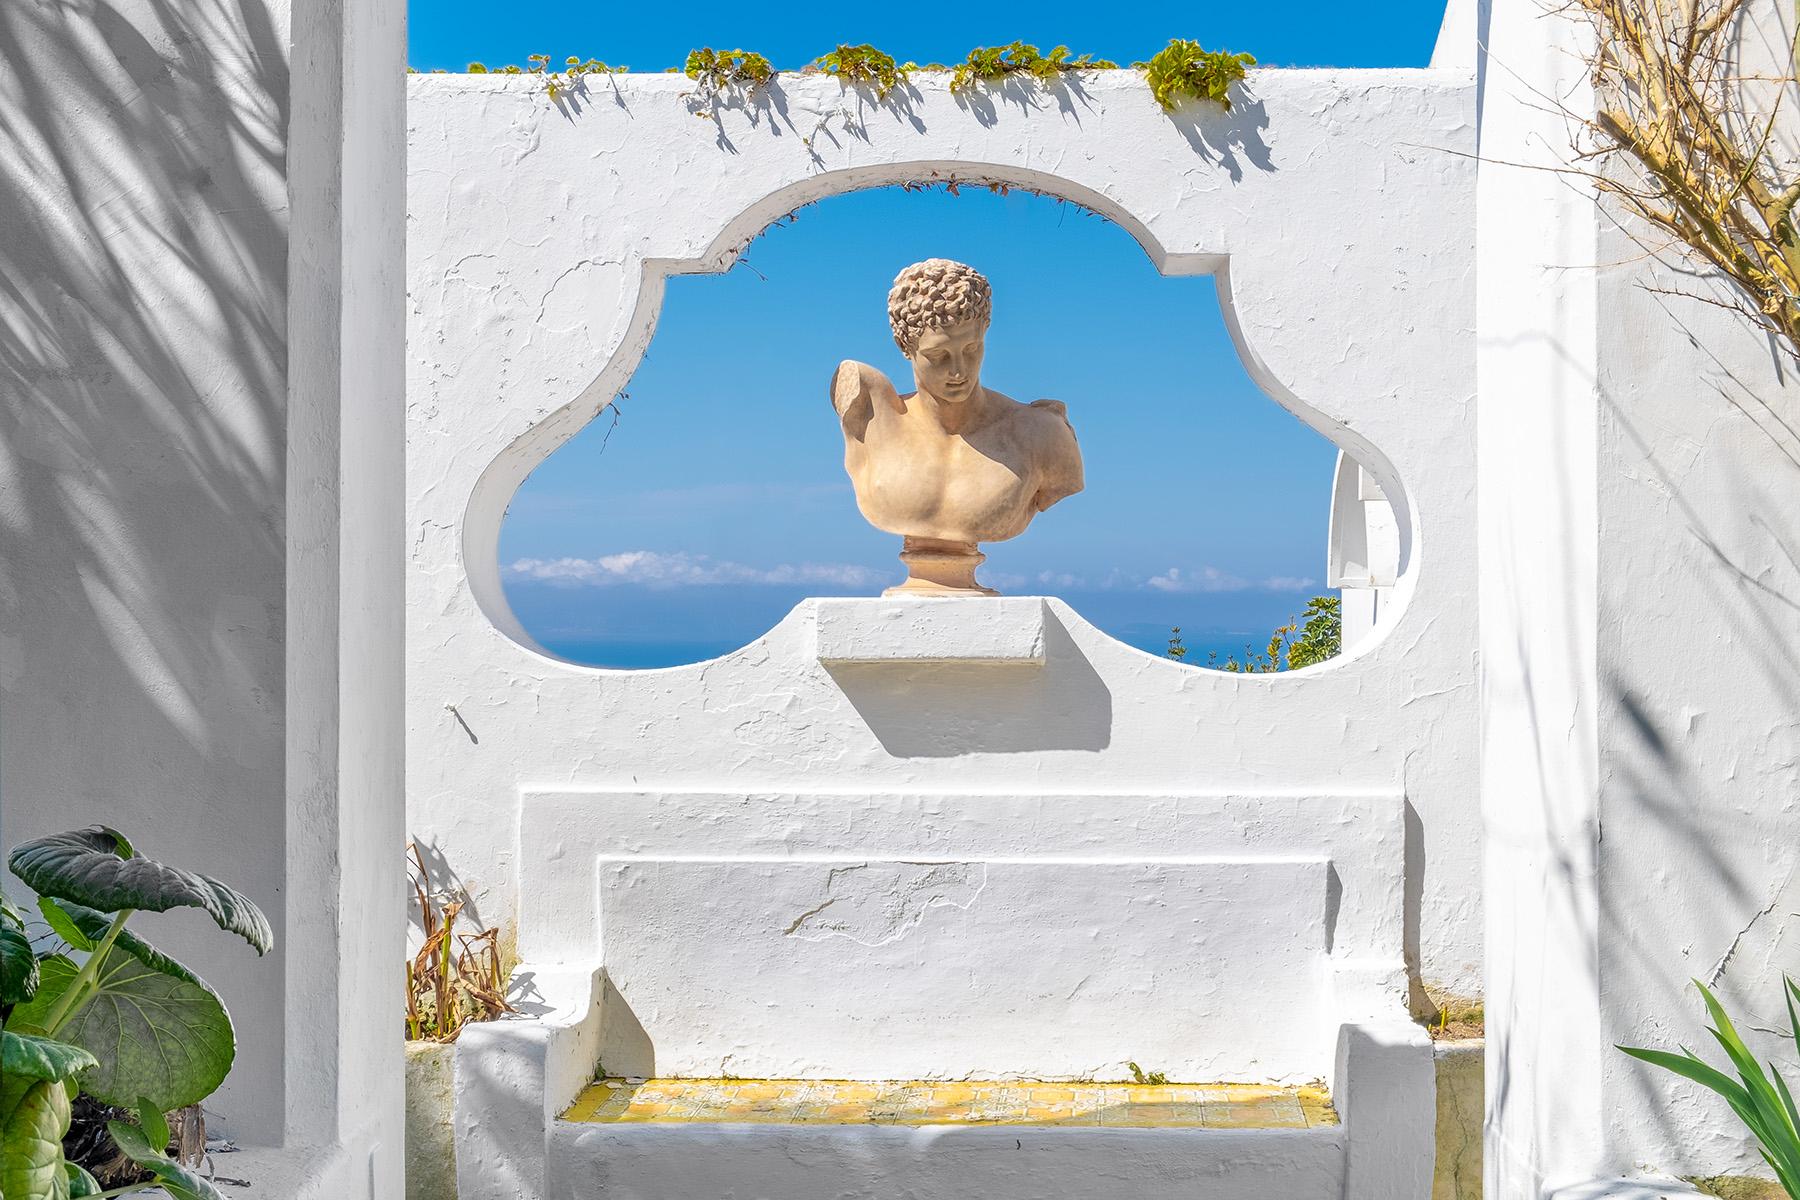 Casa indipendente in Vendita a Capri: 5 locali, 300 mq - Foto 23